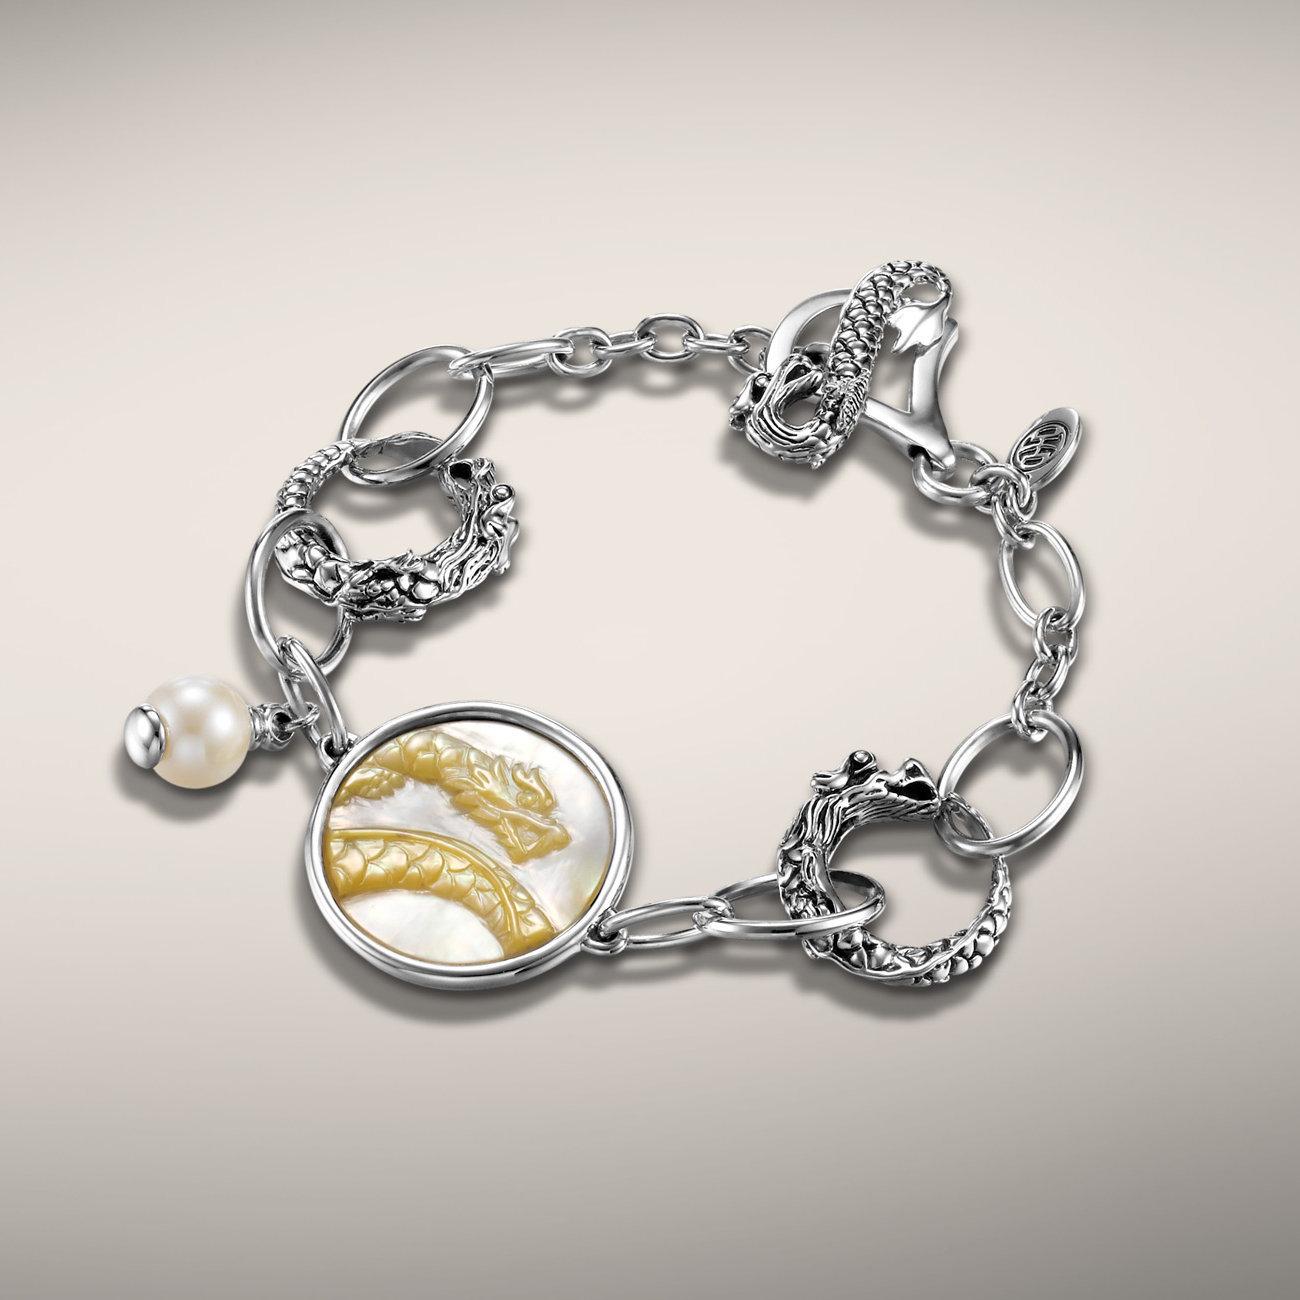 John Hardy naga dragon bracelet with mother of pearl carved dragon. Handmade in Bali.  $450